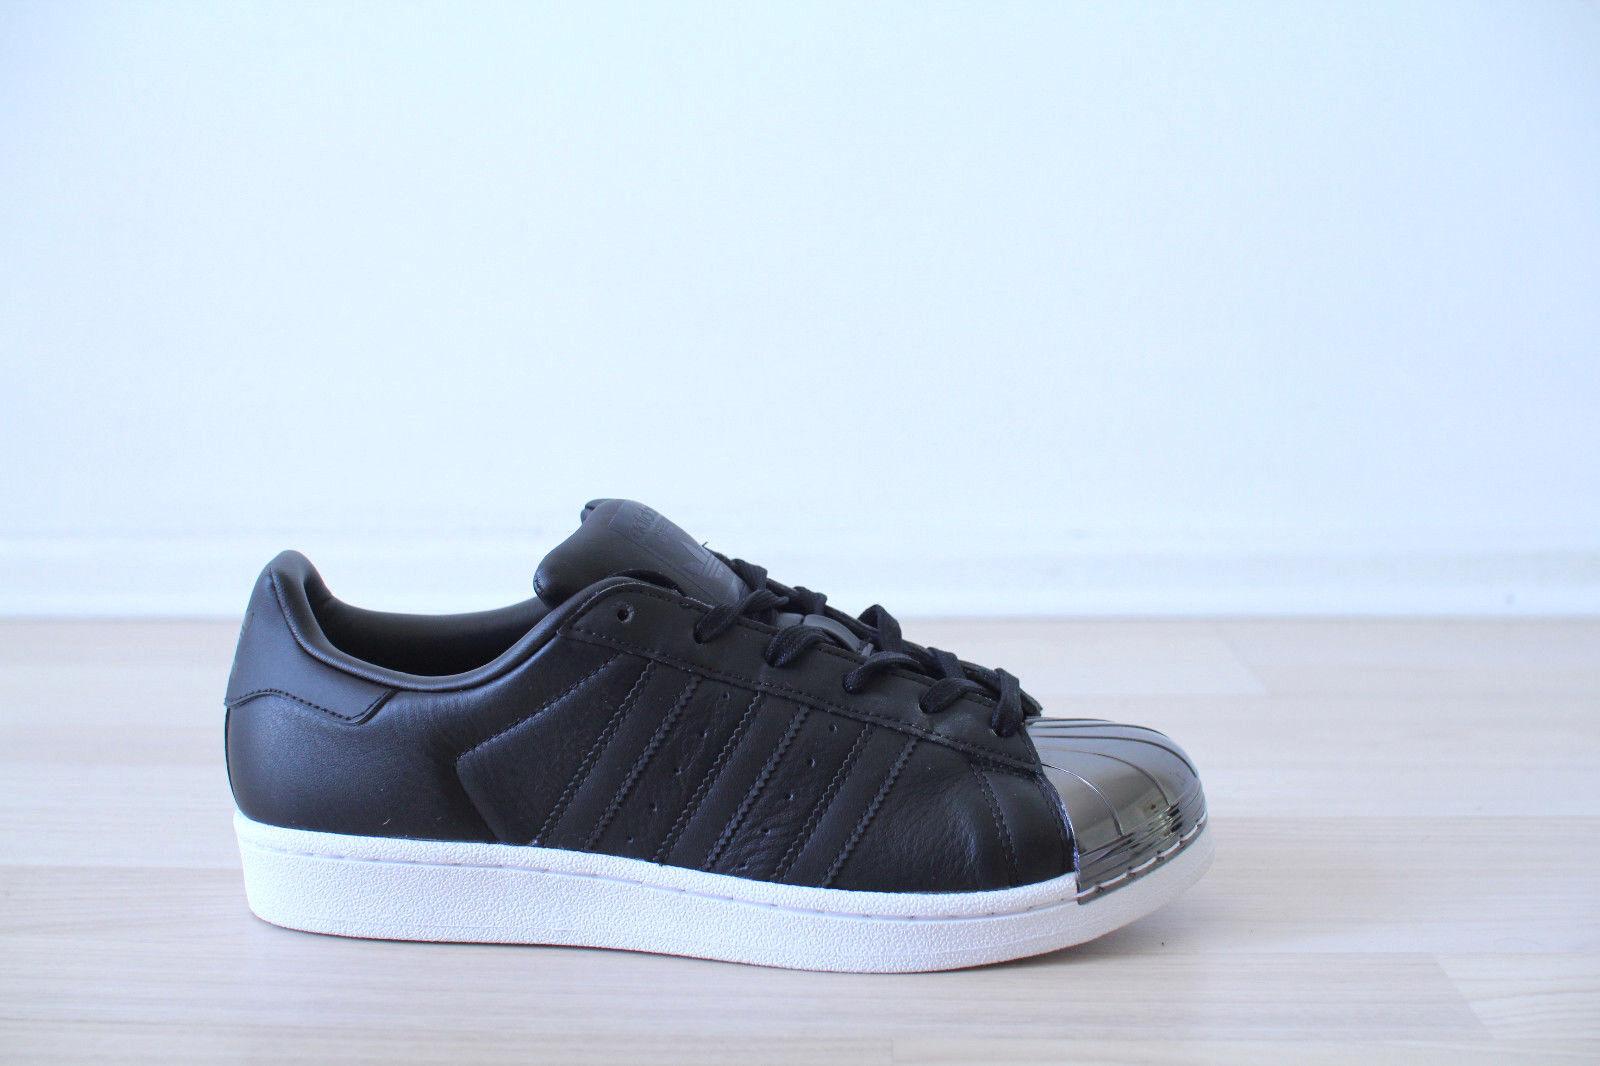 Adidas Superstar Metal Toe W black white Gr. 38,39,40 NEU & OVP